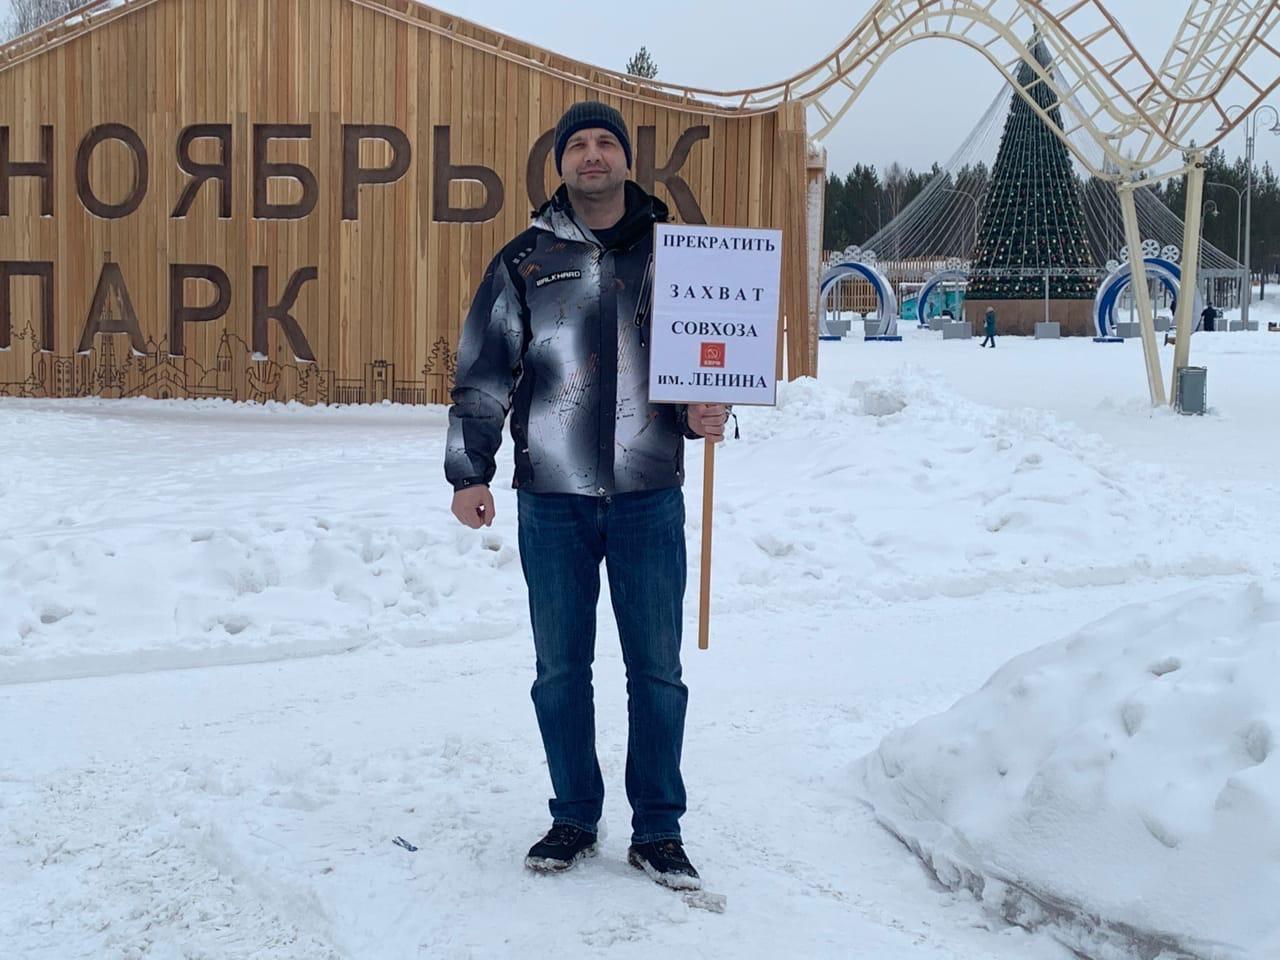 На Ямале продолжаются акции в защиту Грудинина и Левченко